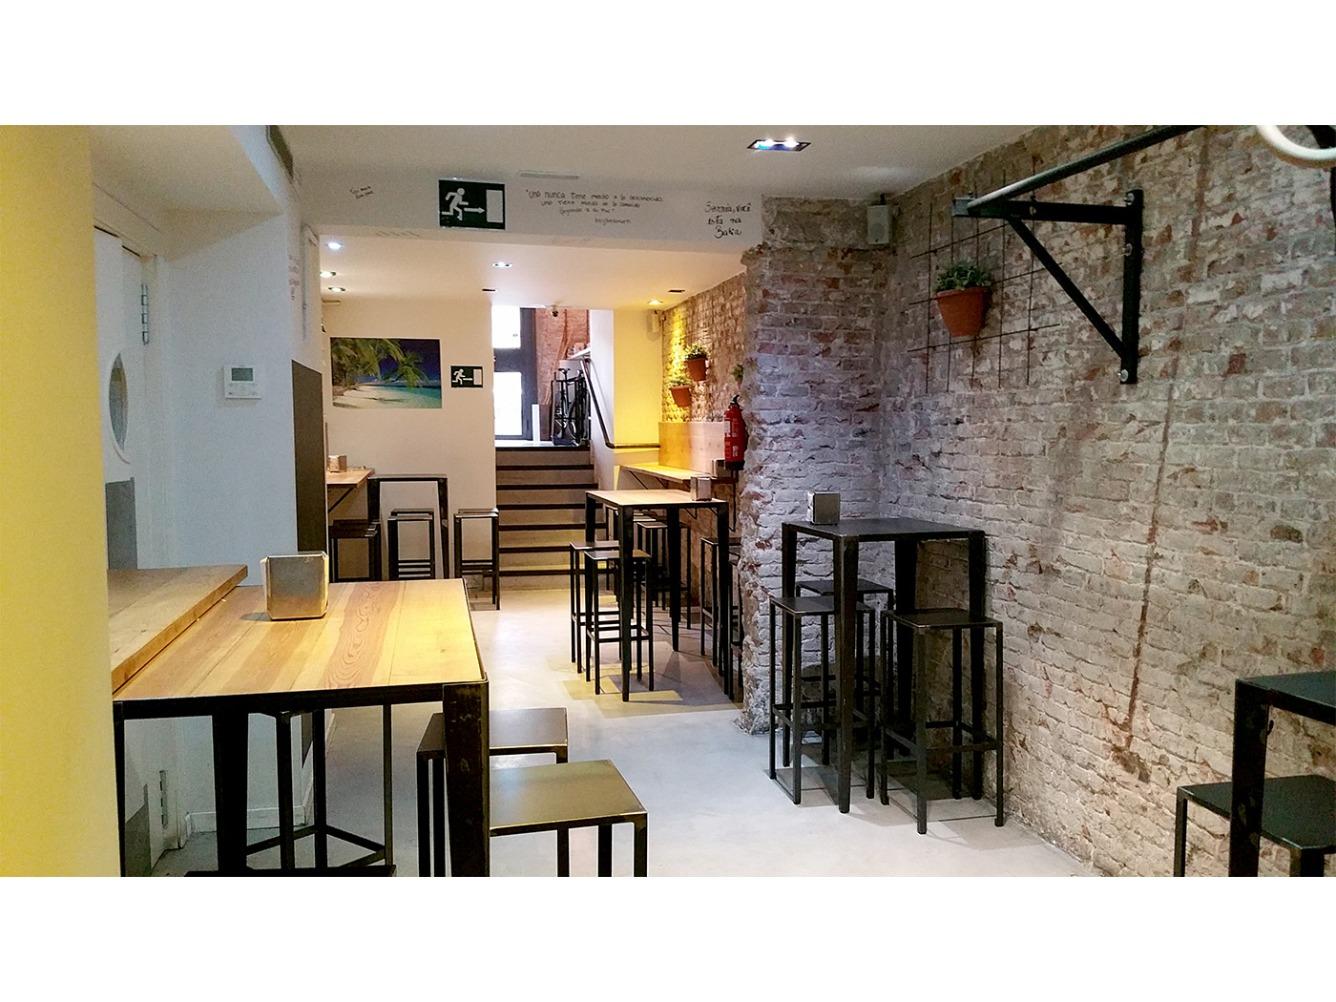 Commercial premises for transfer business in Sant Antoni